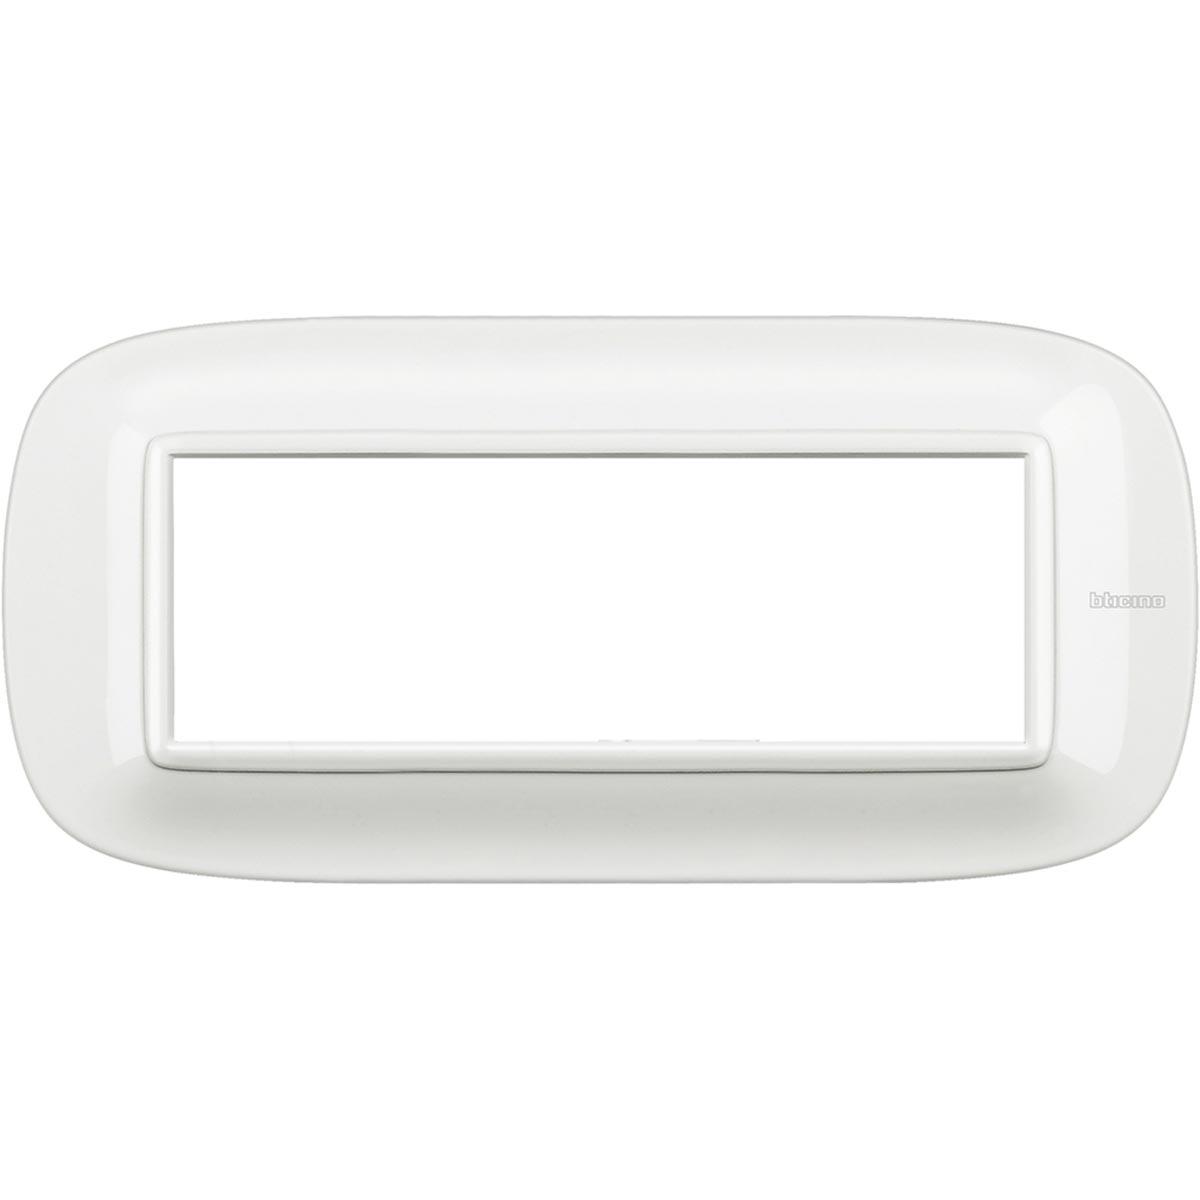 HB4806HD placche axolute bticino bianca ovale 6 posti